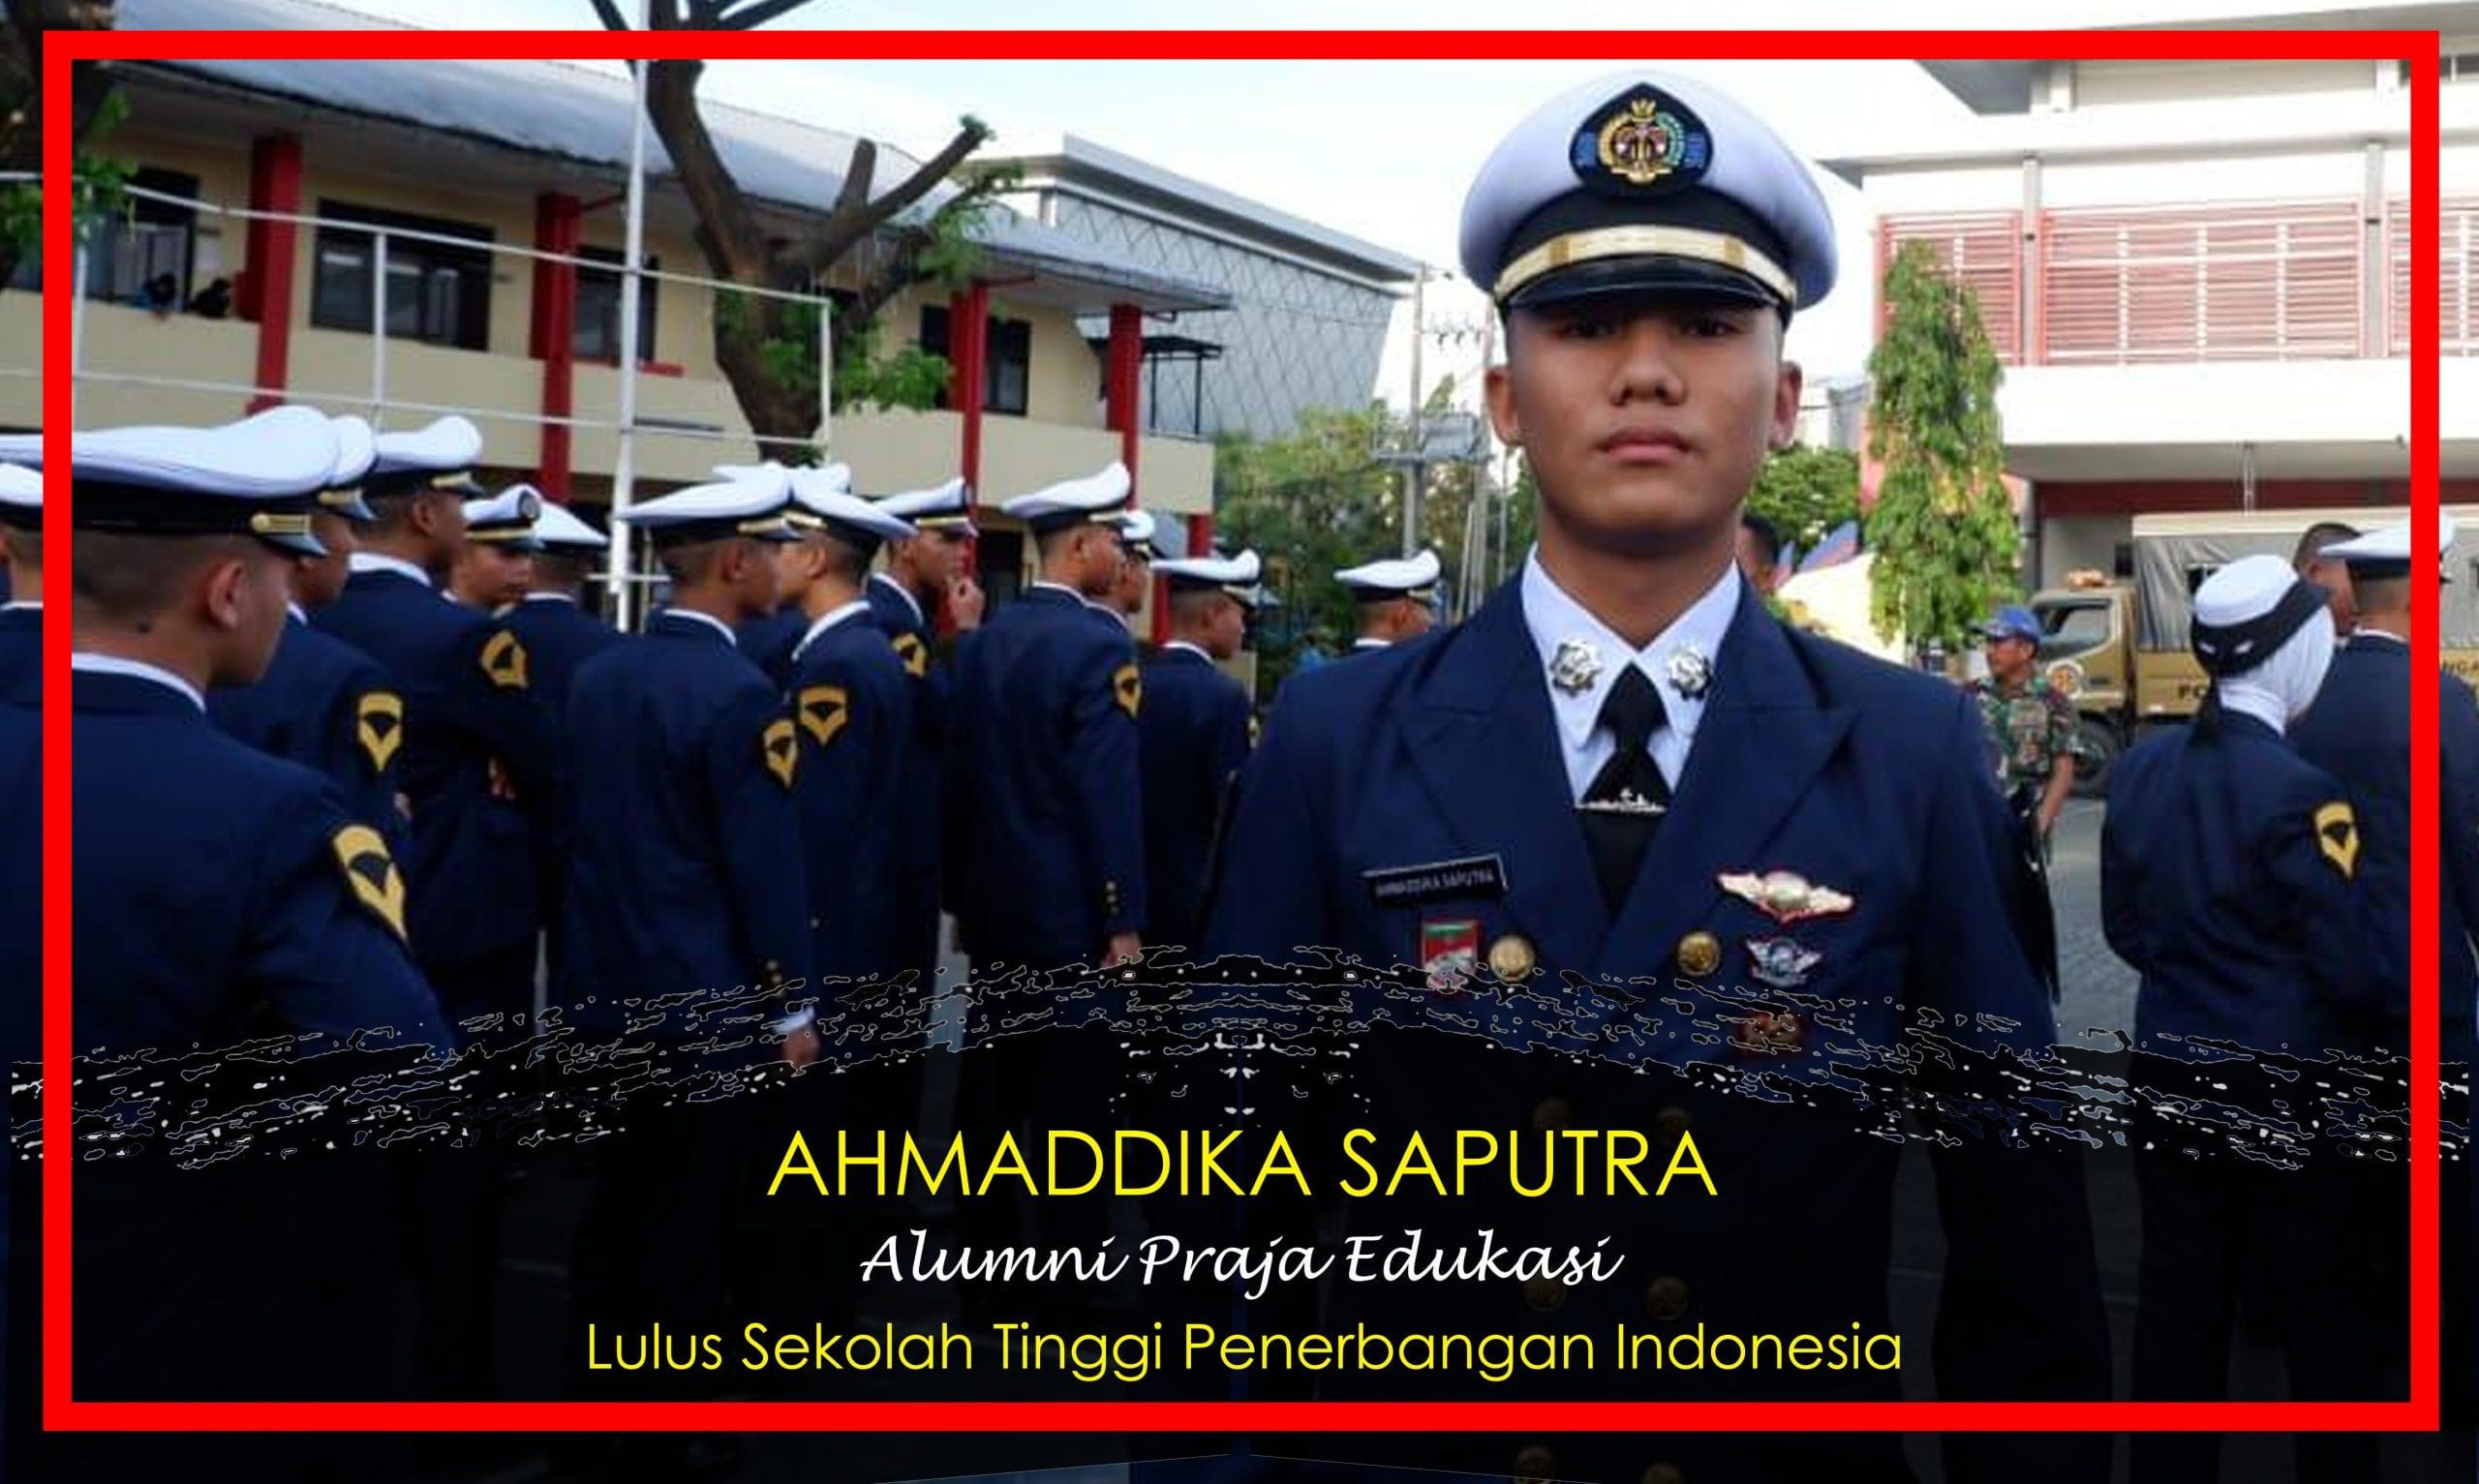 Ahmaddika